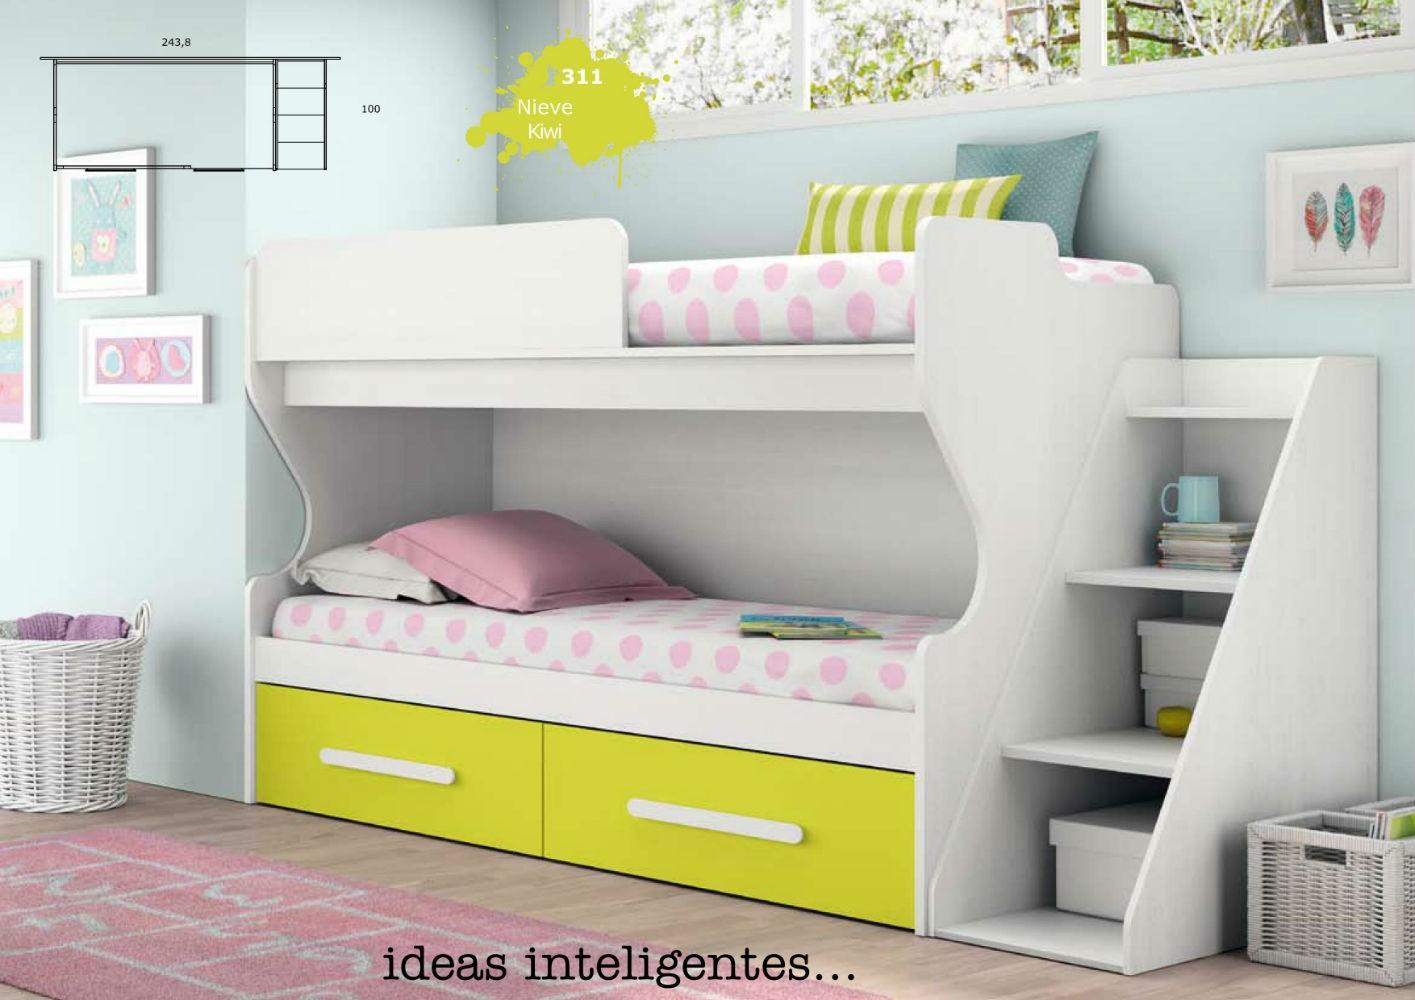 Litera mueble dormitorio infantil juvenil completo moderno for Literas juveniles economicas